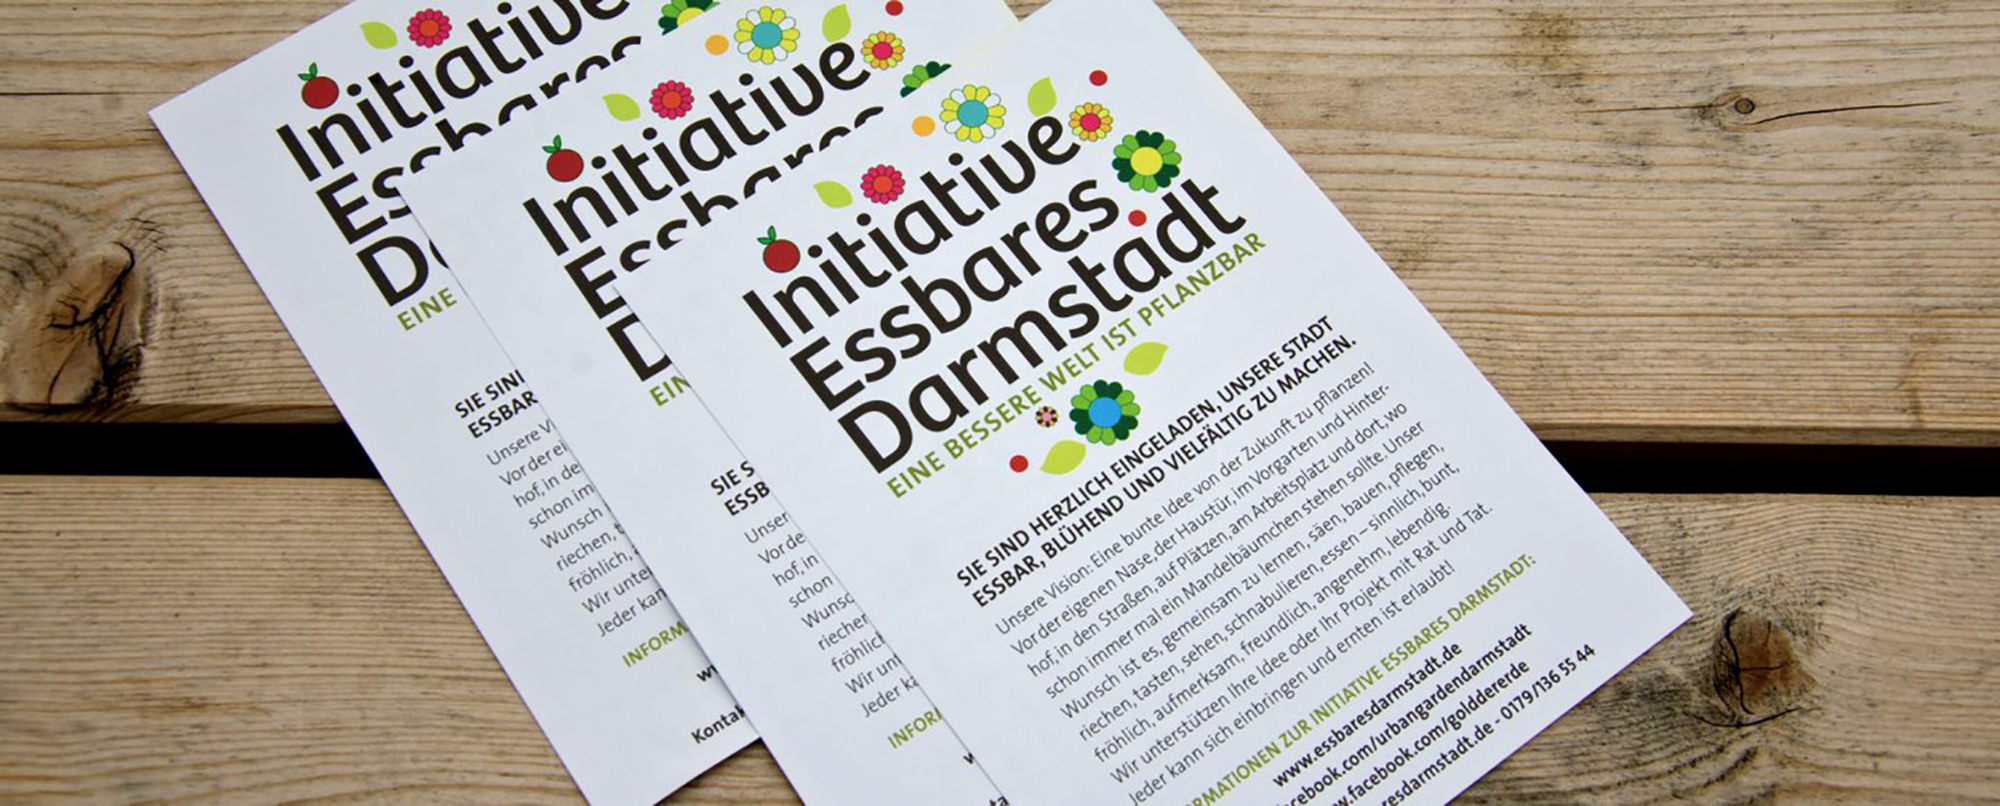 Initiative_Essbares_Darmstadt